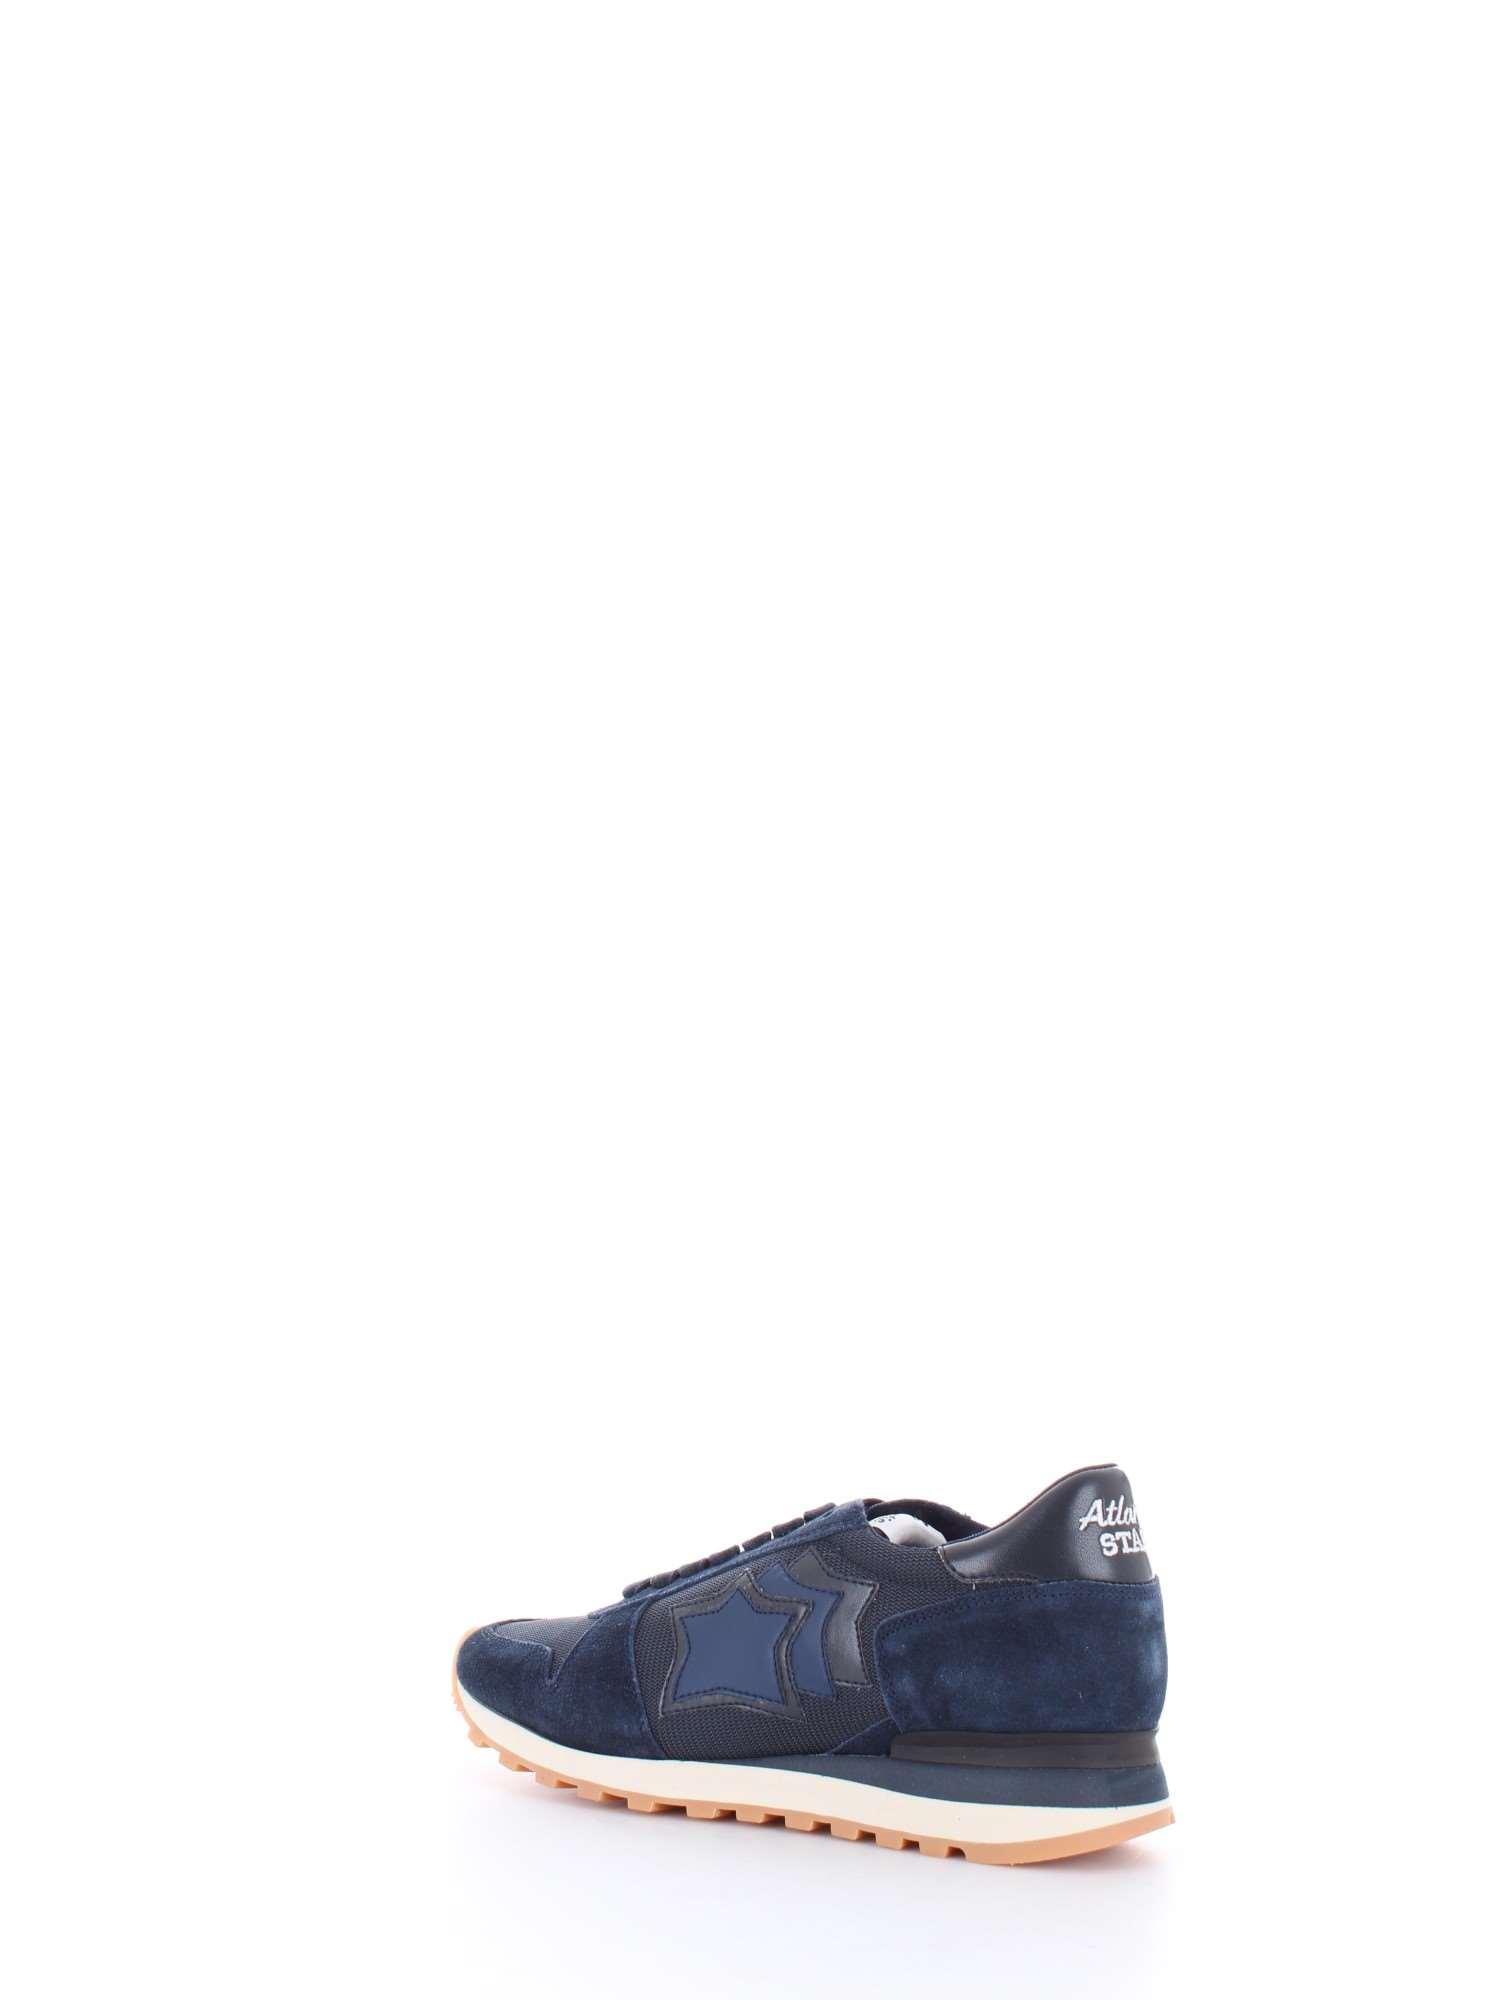 Bleu Stars Homme été Sneakers dbnyapbn Argo Printemps Atlantic TUAwfqxU